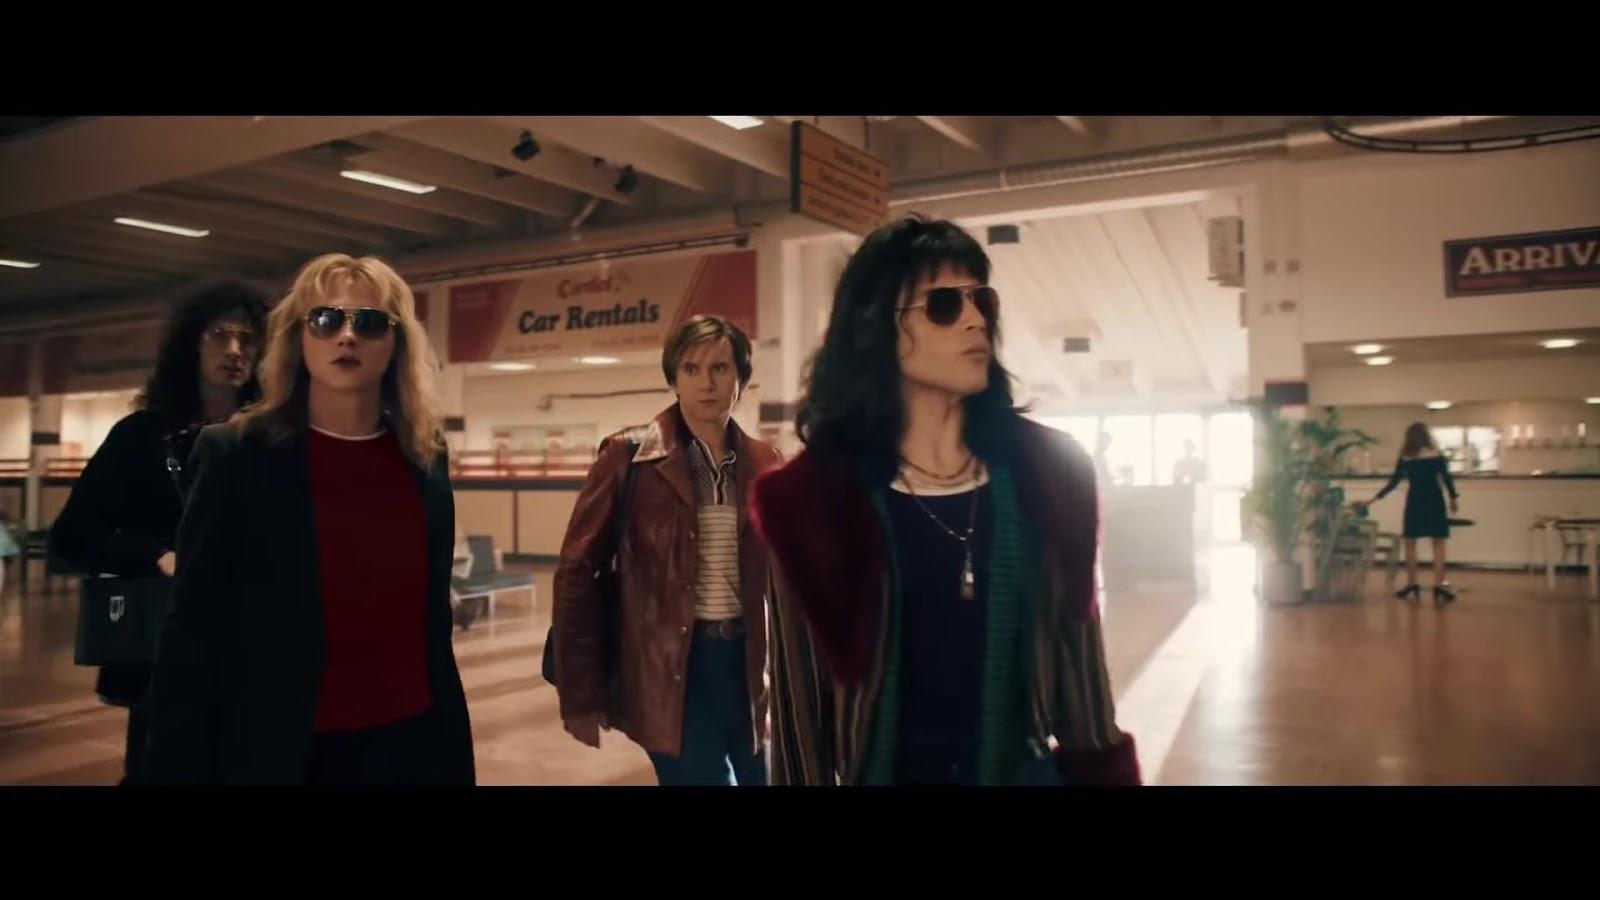 869d383574b Rami Malek as Freddie Mercury and Queen Band Members in Bohemian Rhapsody  wearing Sunglasses